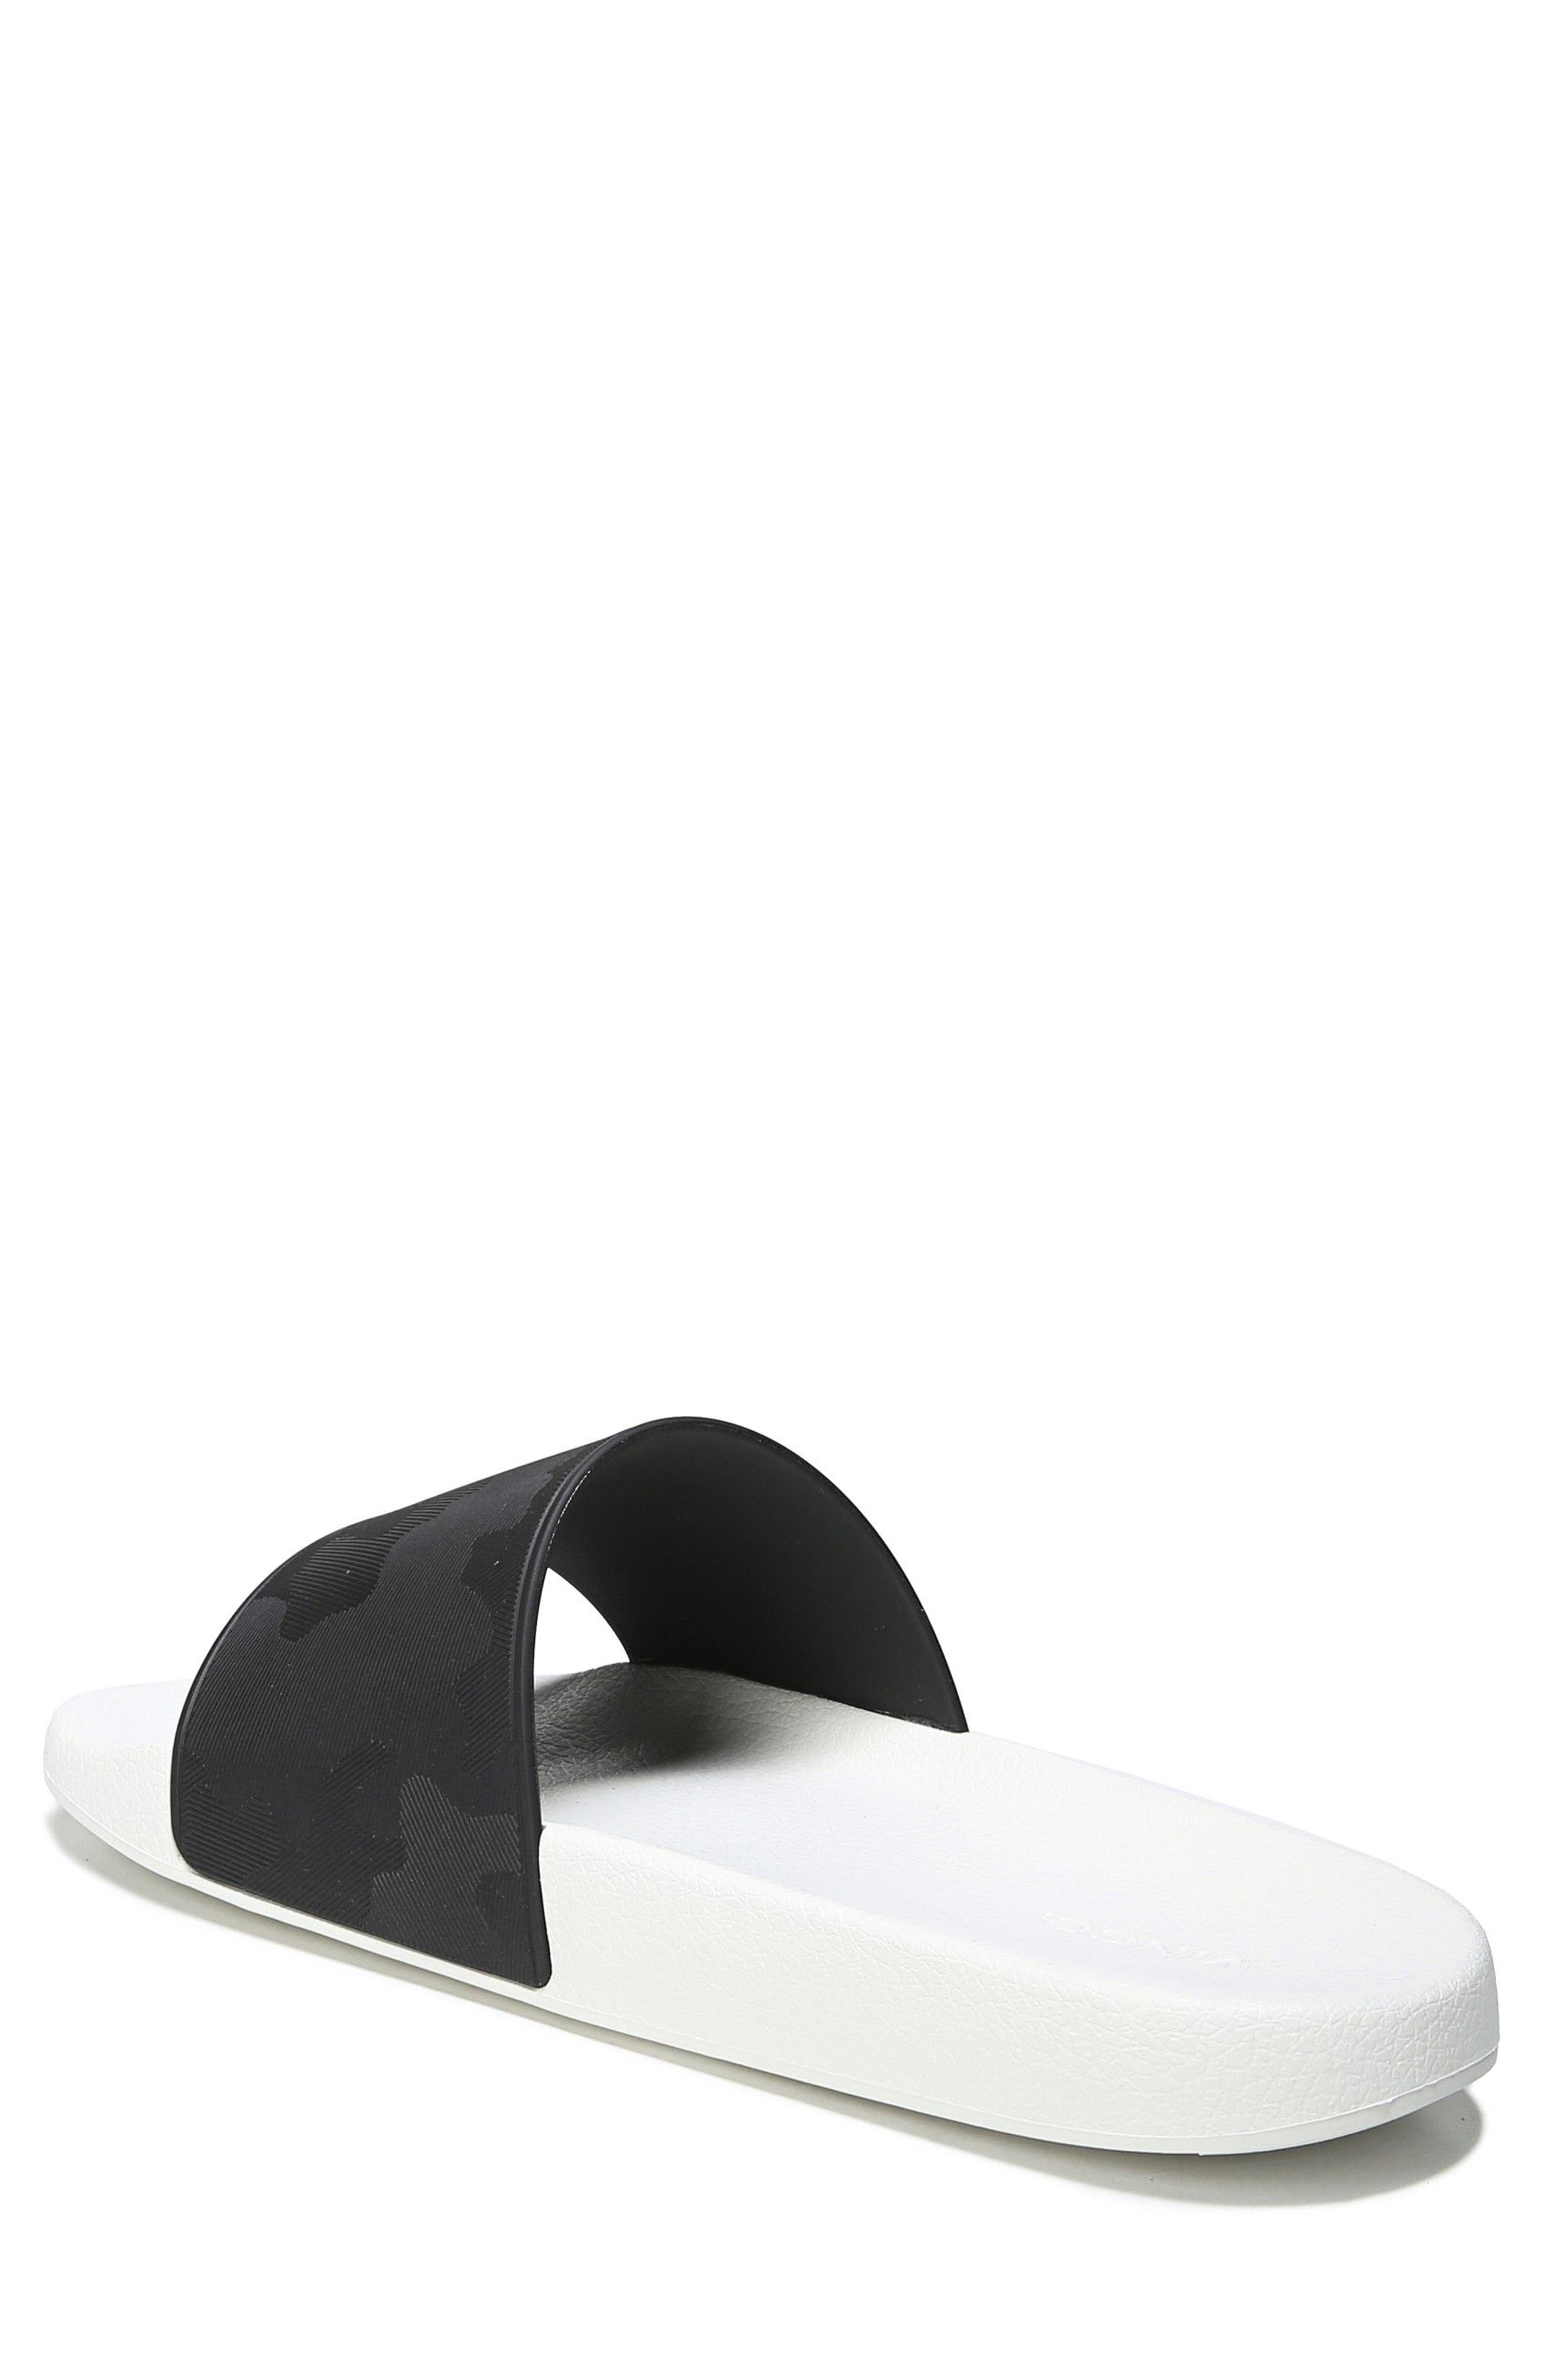 Westcoast-2 Slide Sandal,                             Alternate thumbnail 2, color,                             Black